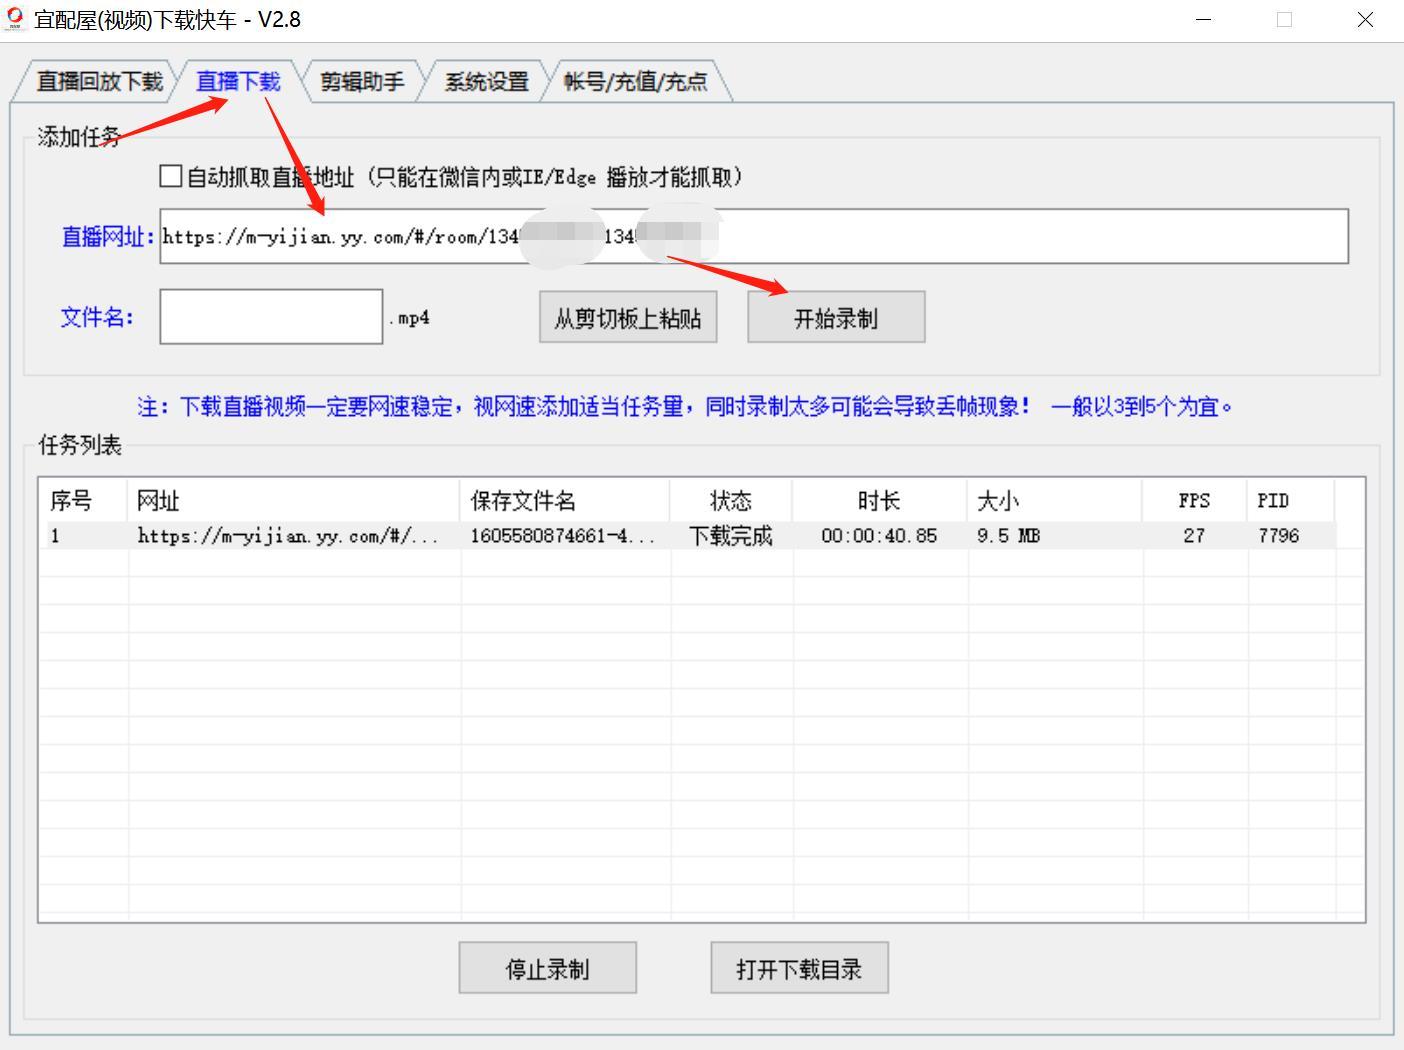 YY直播视频怎么保存视频 怎样下载正在直播的YY直播视频 保存成mp4格式